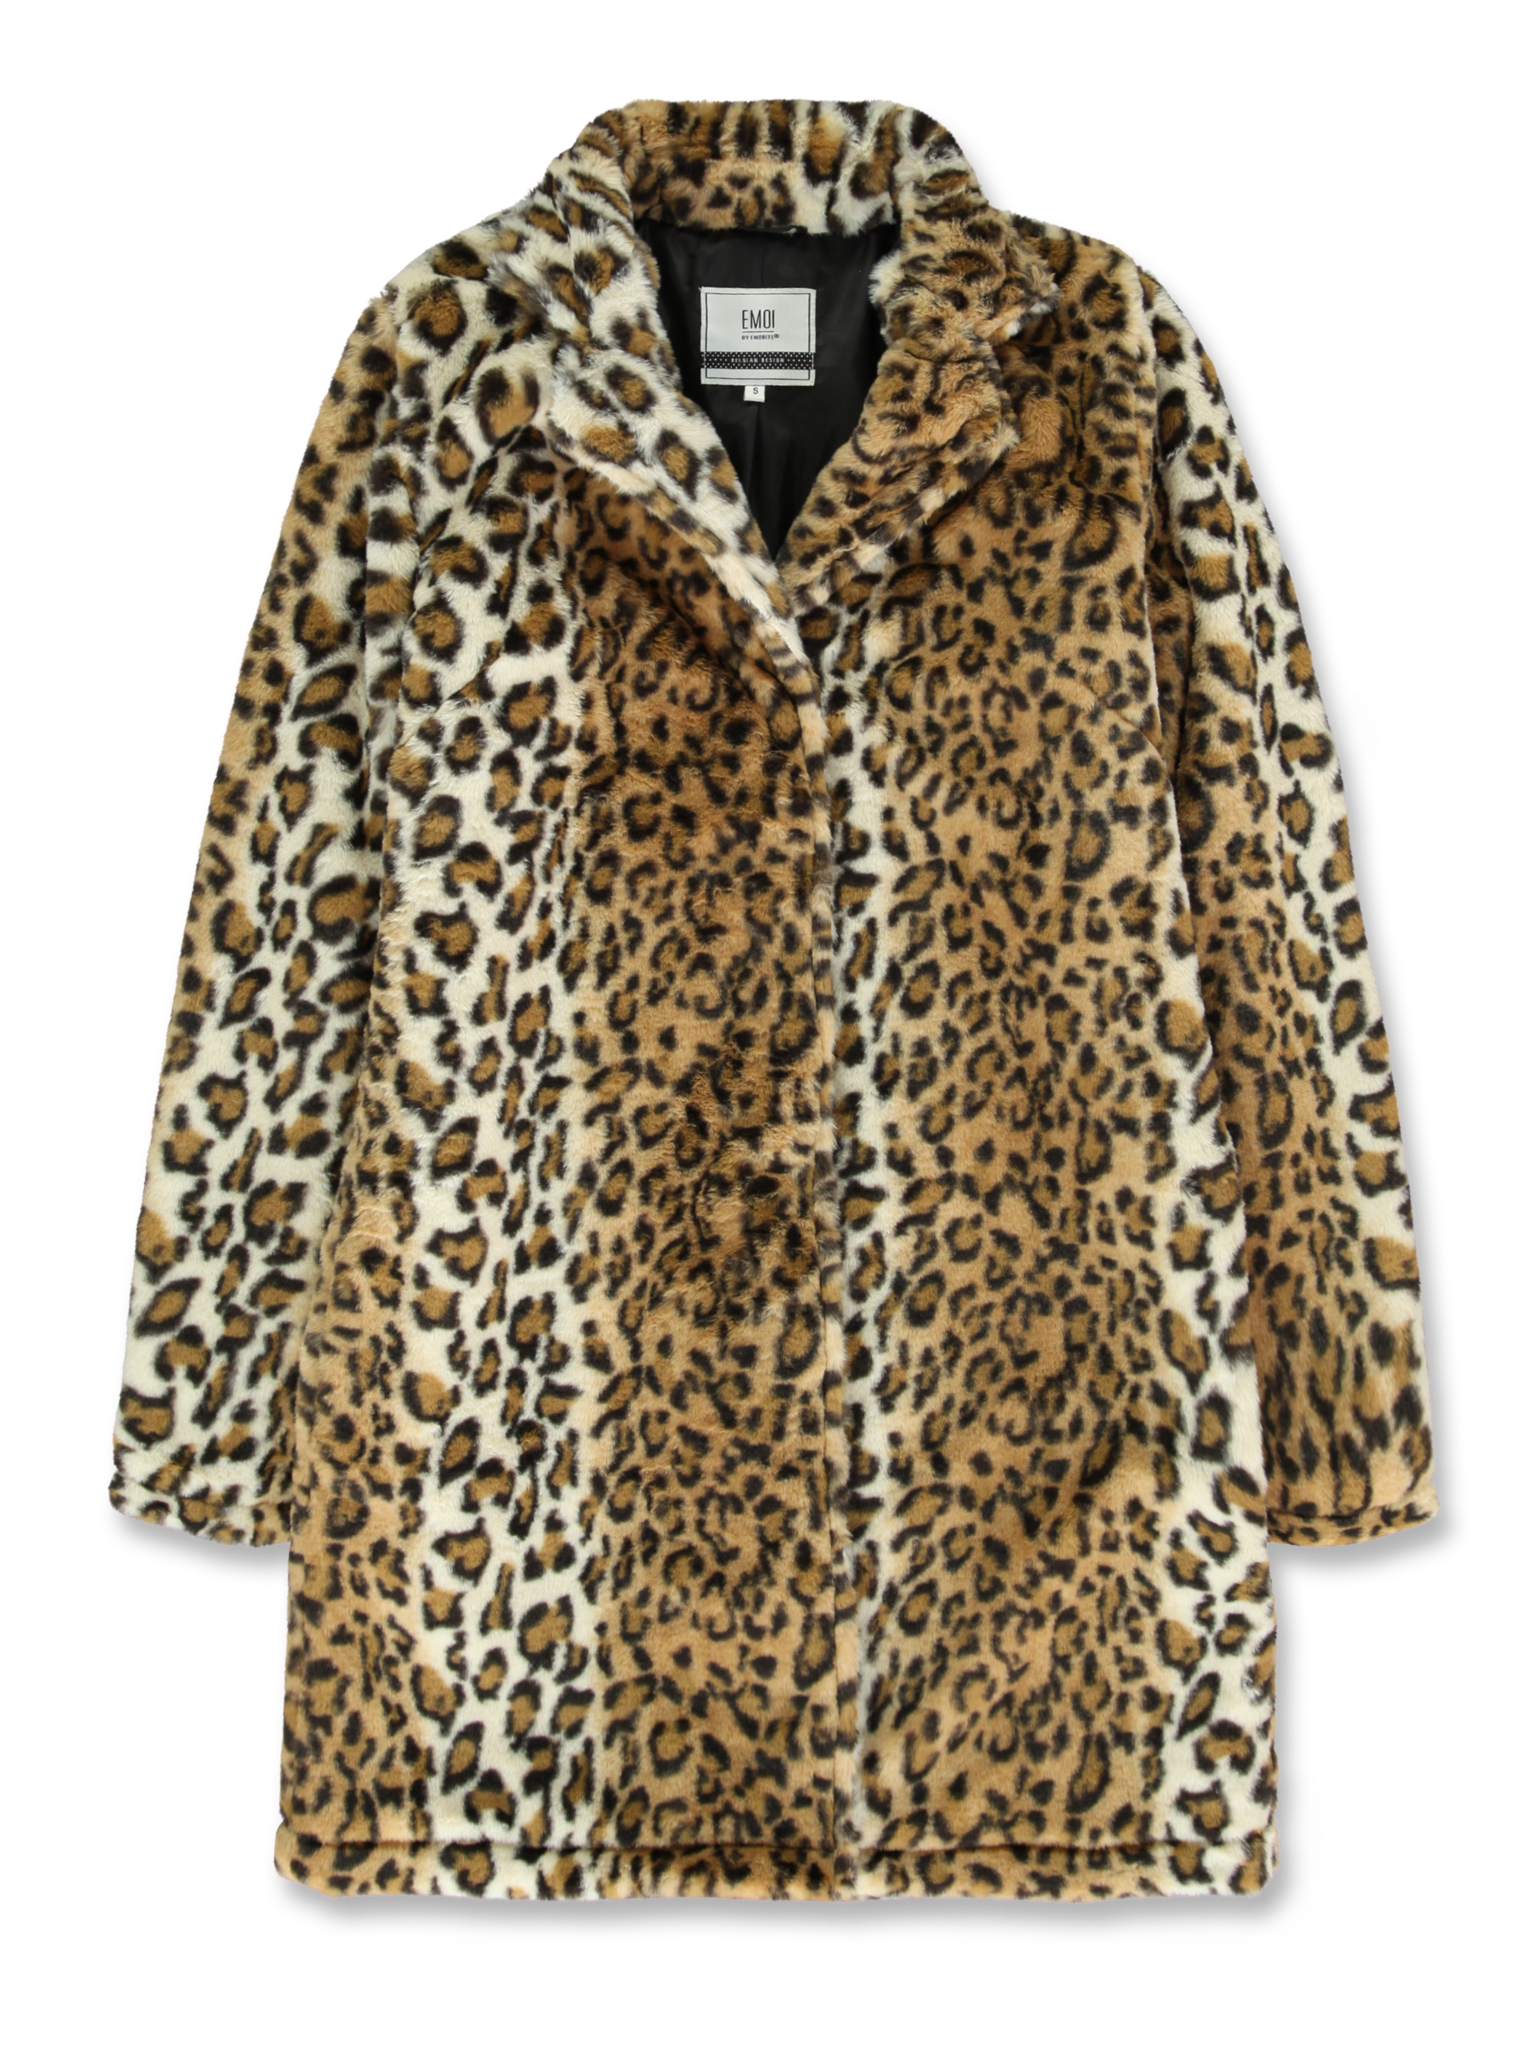 Emoi | Winter 2019 Ladies | Jacket | 10 pcs/box